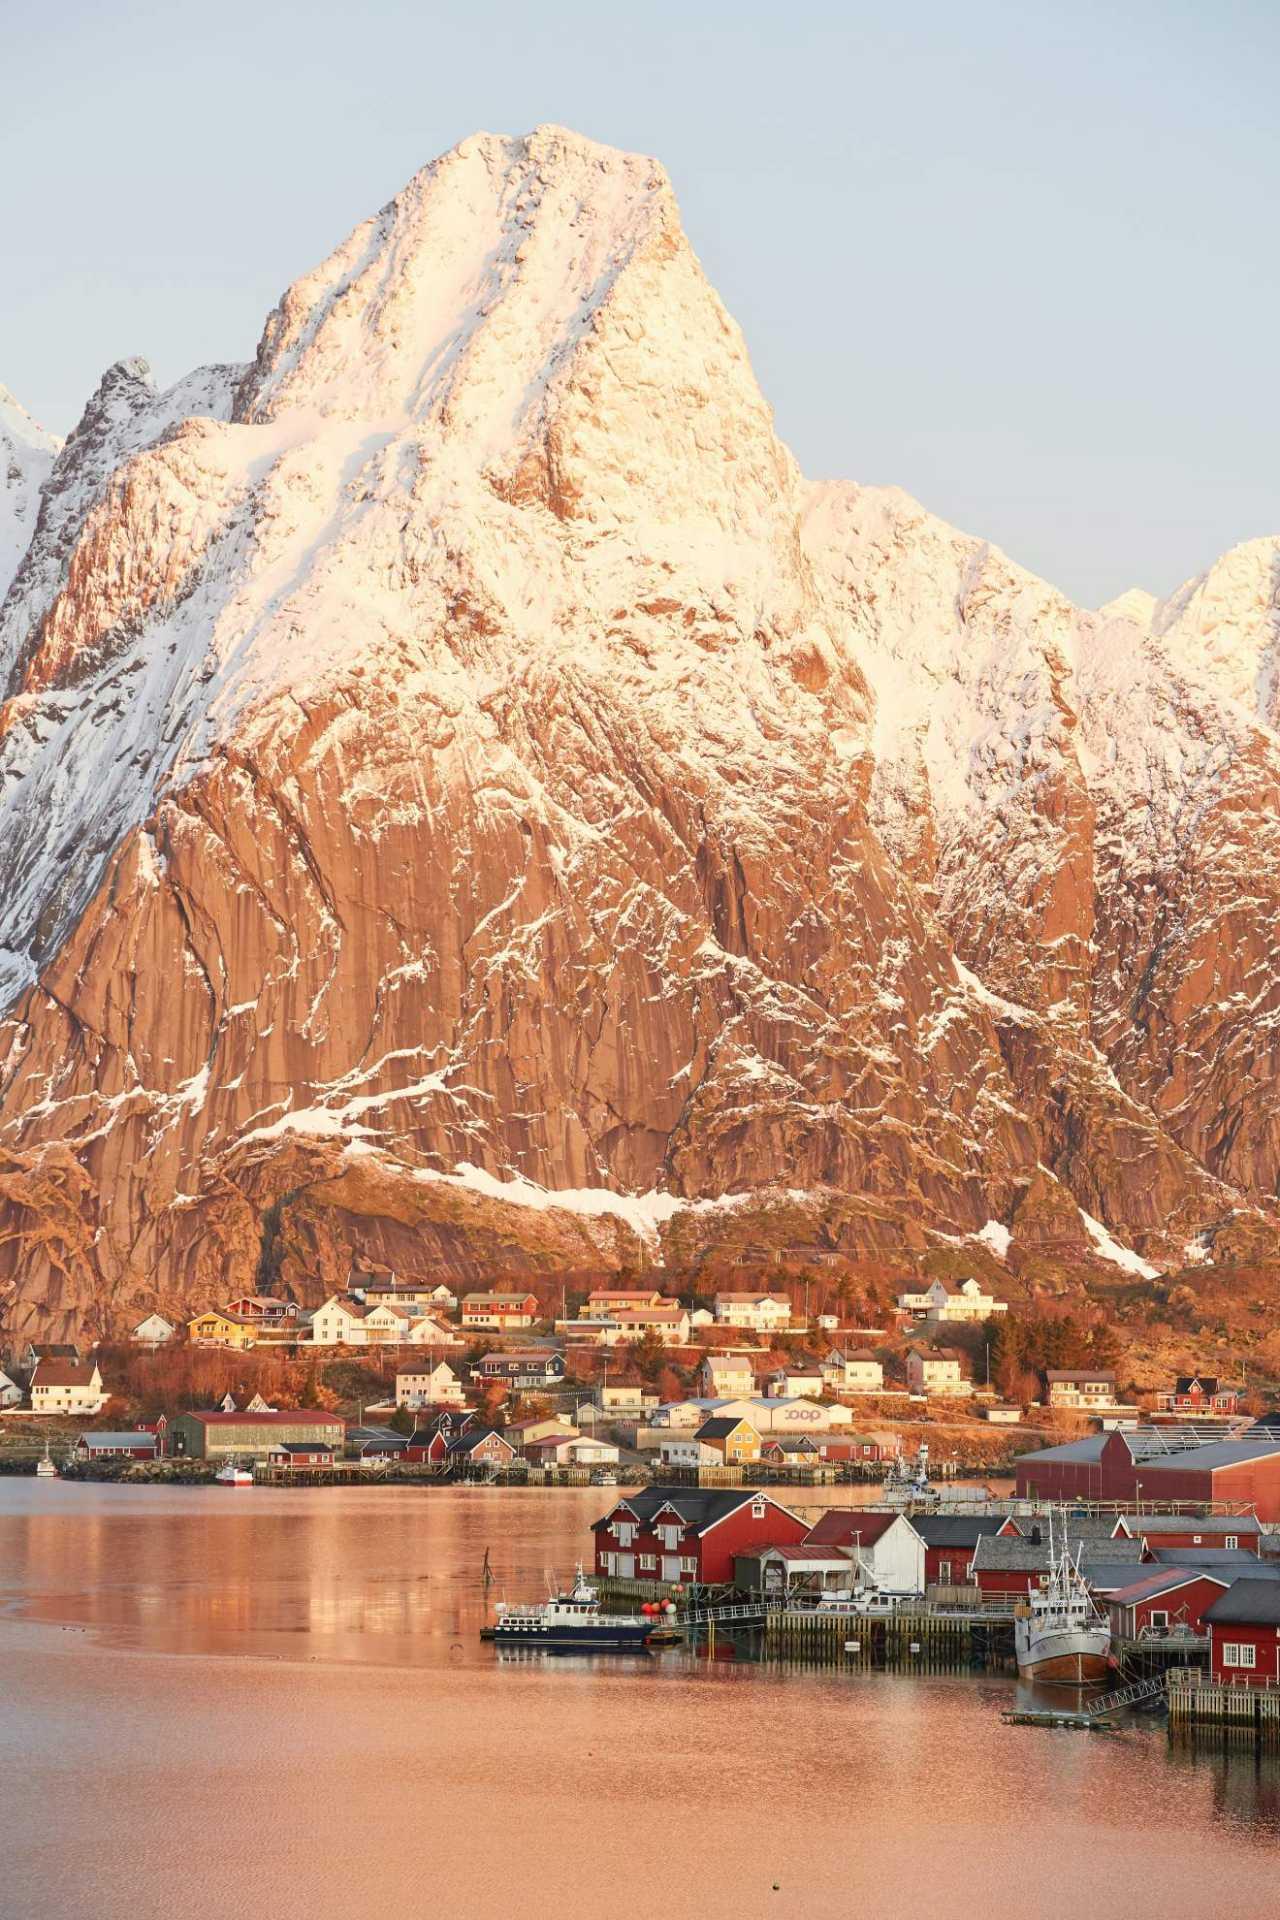 johny goerend q913abUzFCI unsplash - Studia w Norwegii